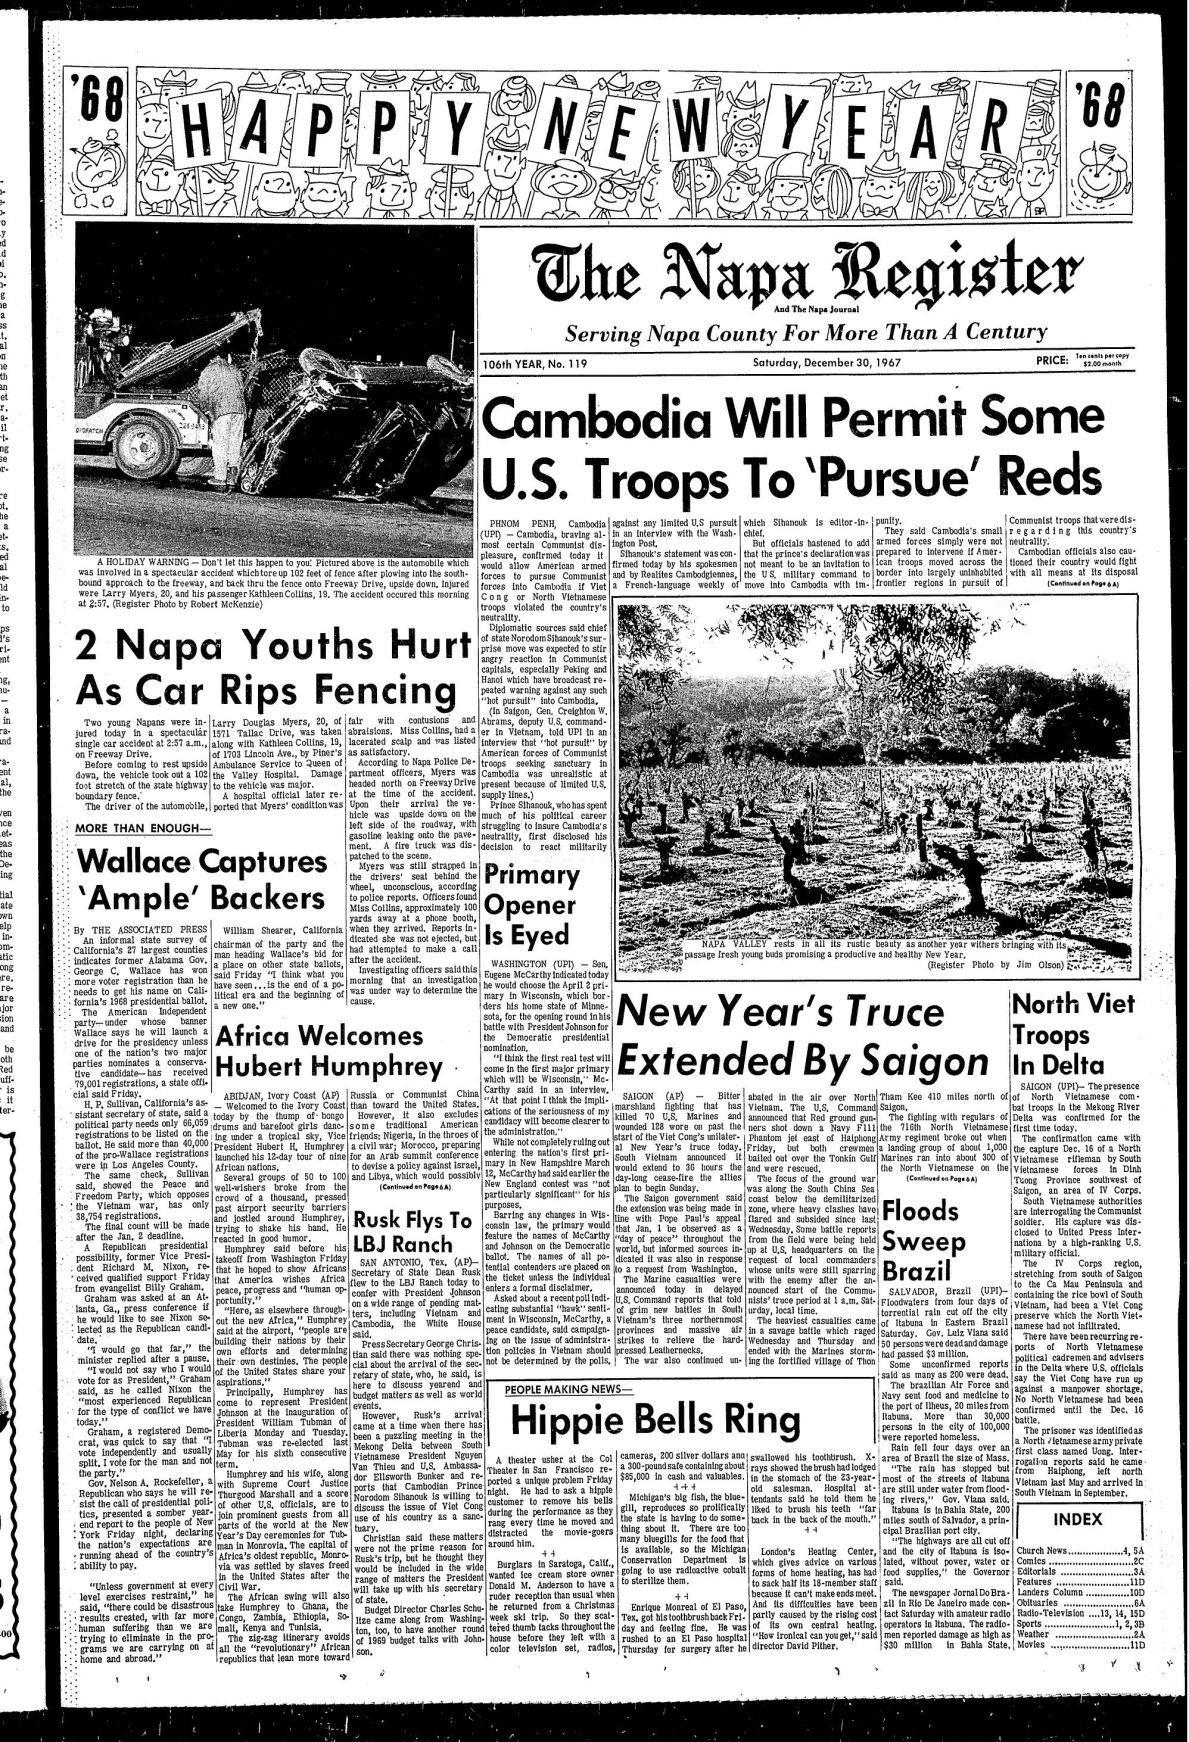 Dec. 30, 1967